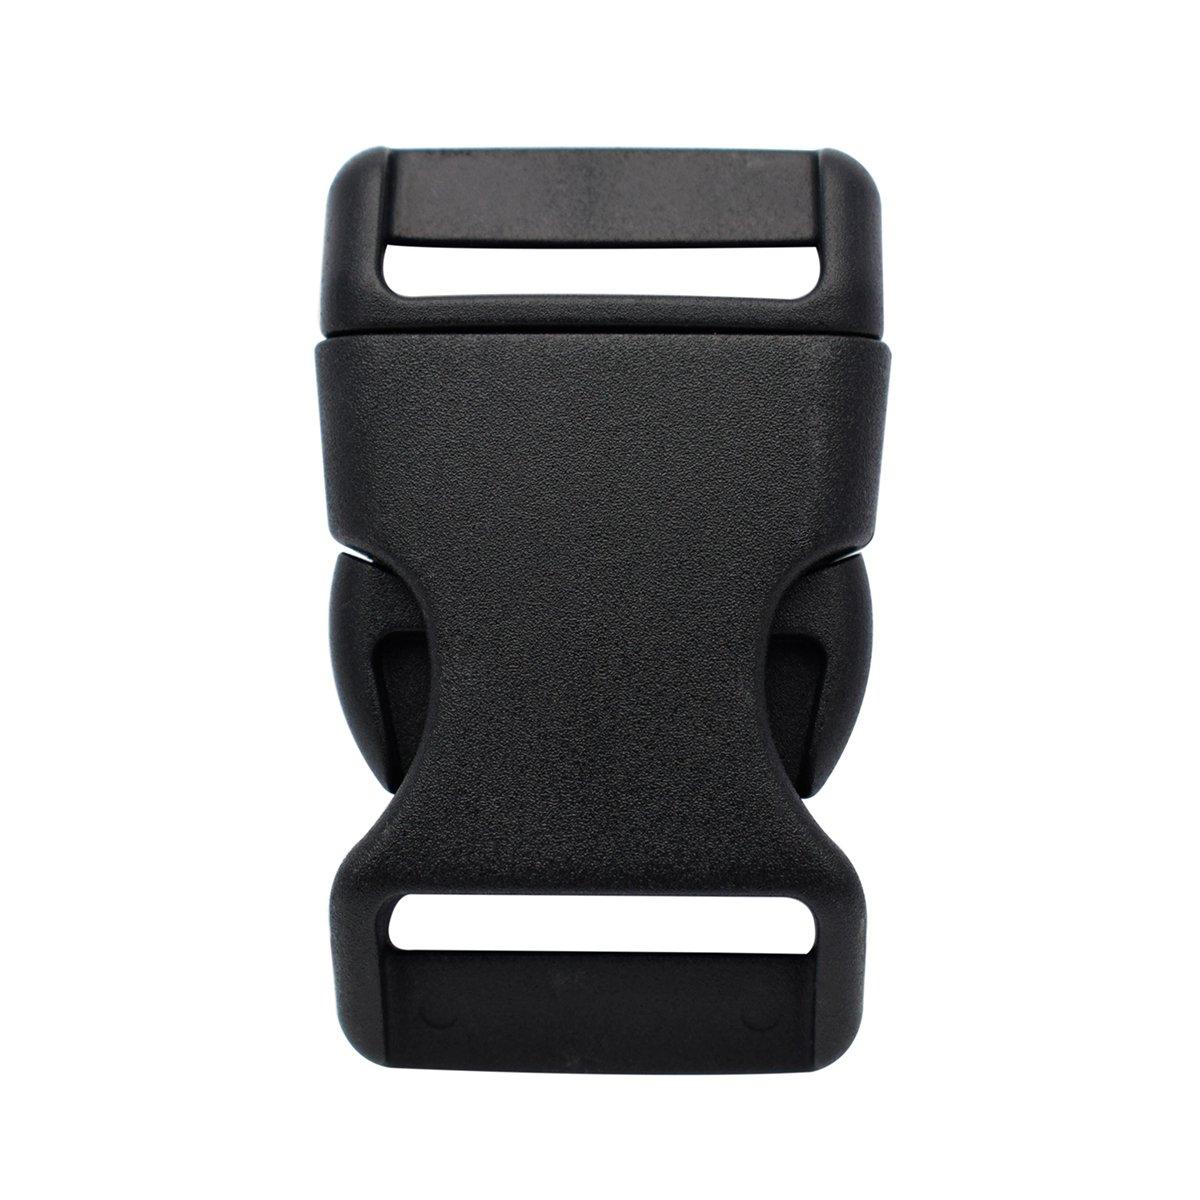 25mm Plastic Buckles Contoured Side Release Buckles Black Clasp for Paracord Bracelet,Bag,Backpack (Pack of 10pcs) KEEJEA